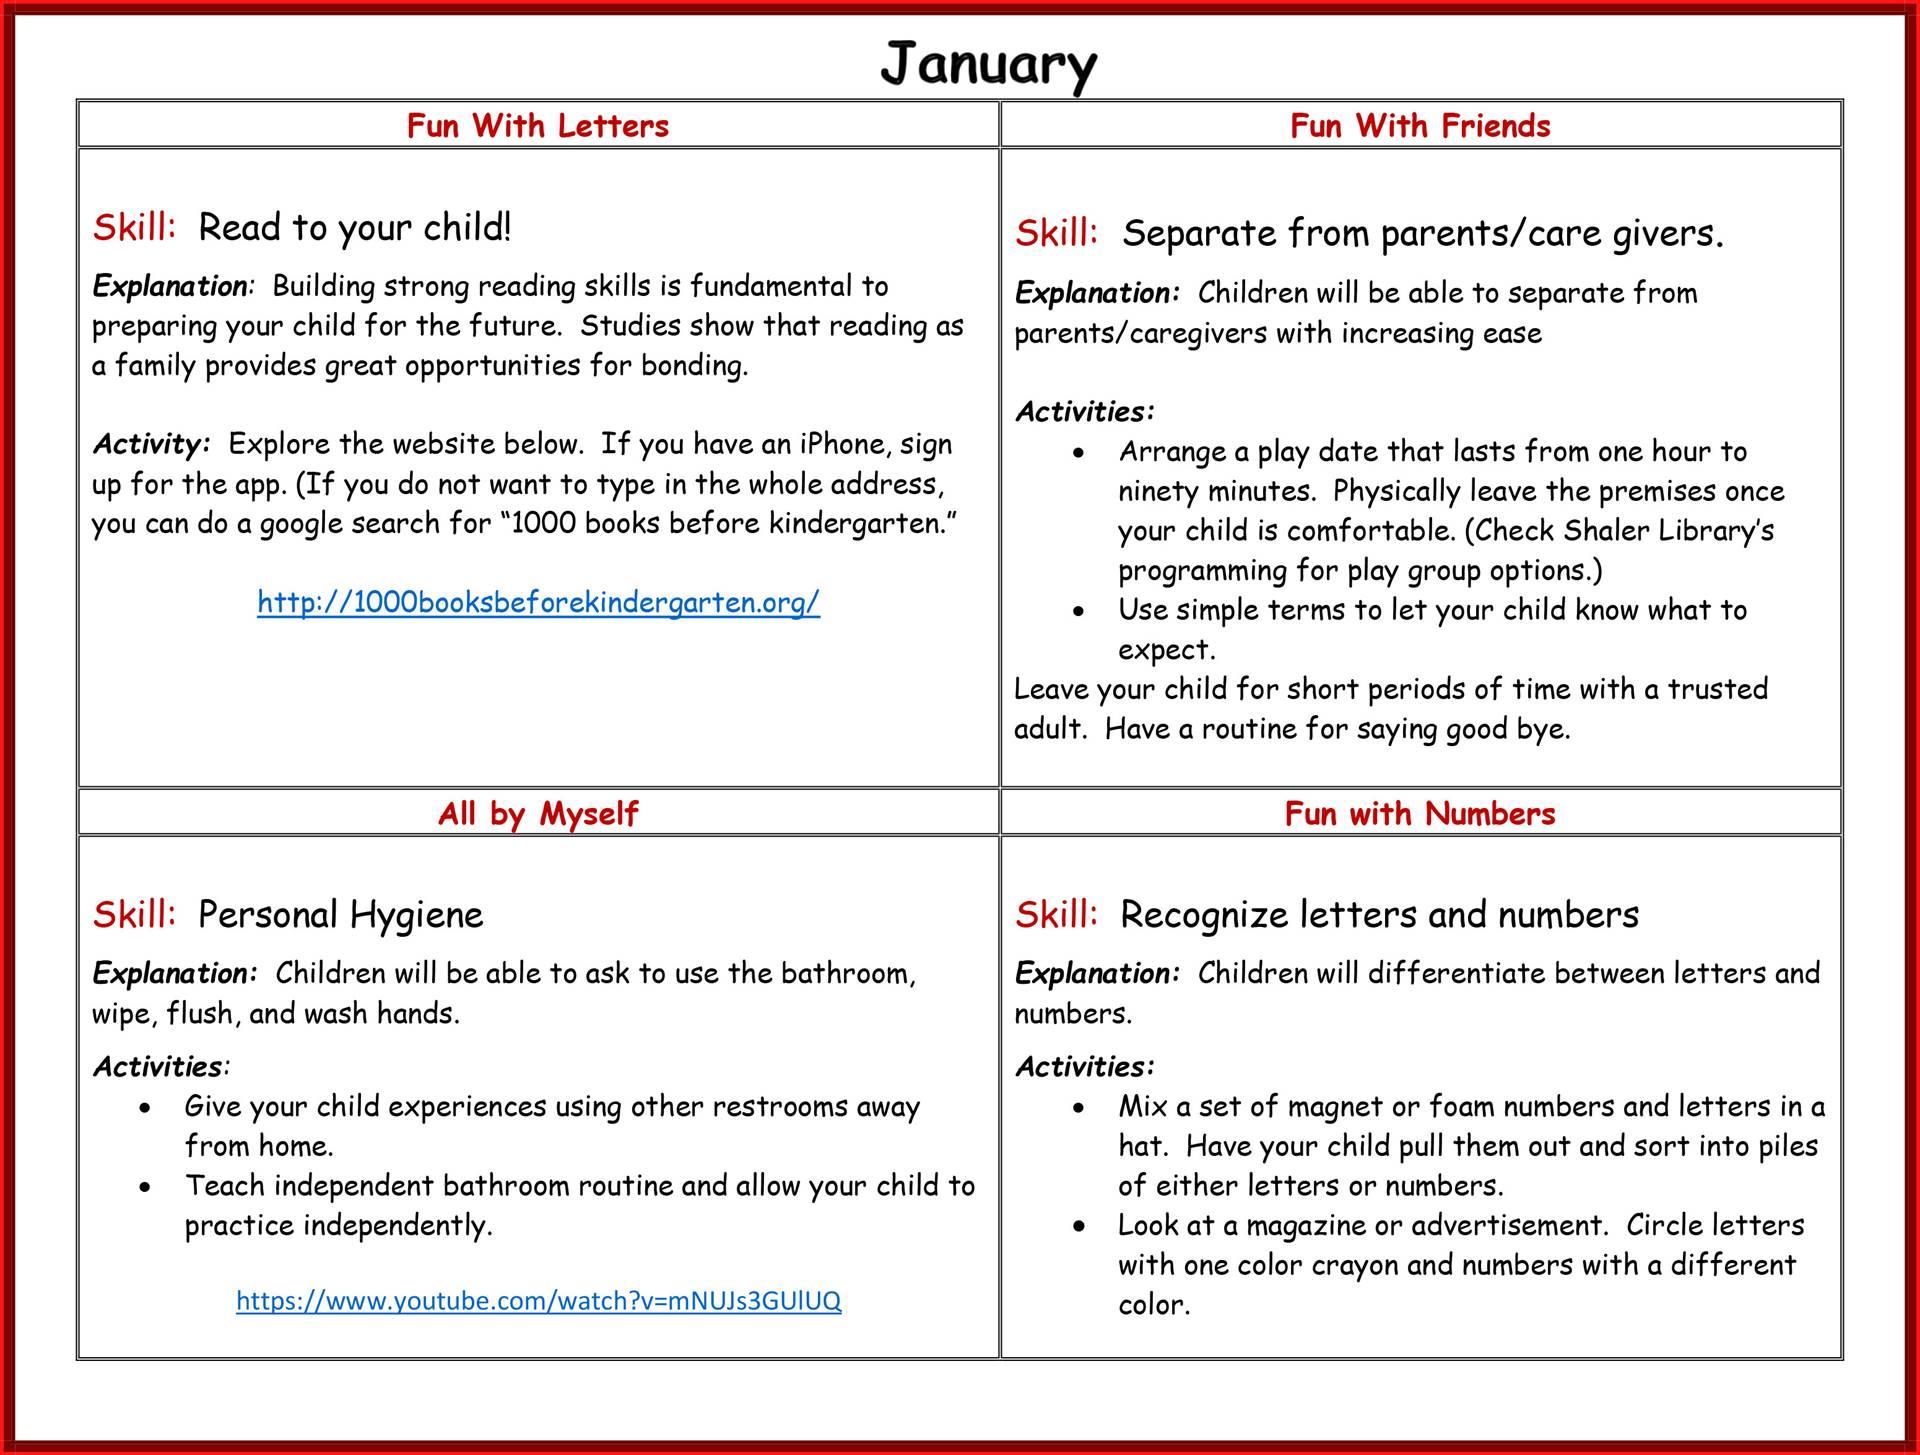 Kindergarten Readiness Calendar - January page 2